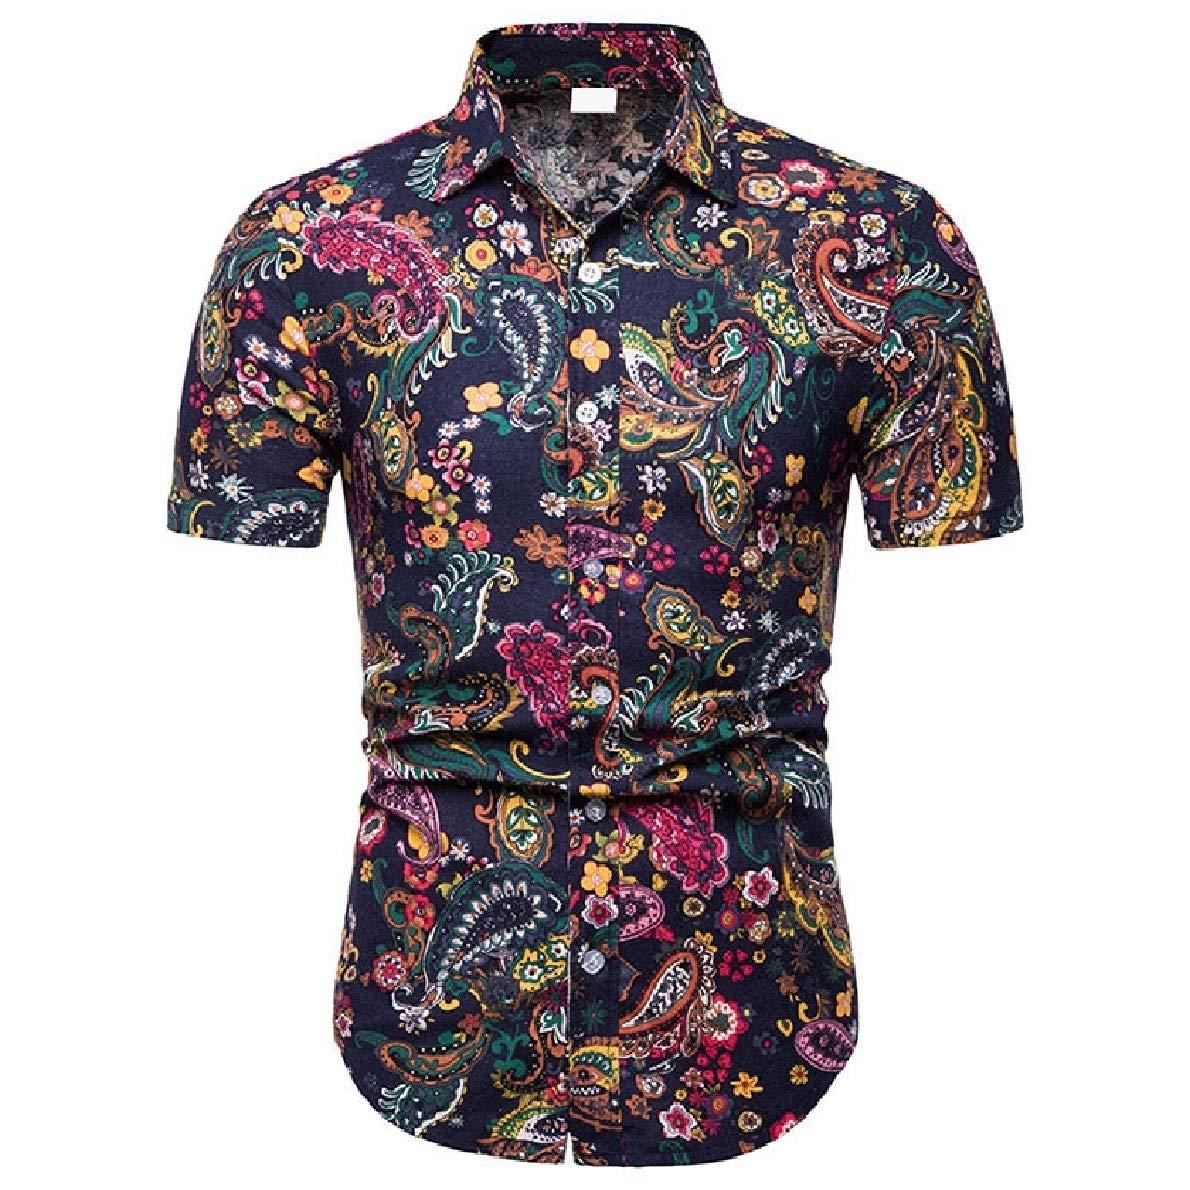 Zimaes-Men Turn Down Collar Beachwear Navajo Floral Short Sleeve Dress Shirt